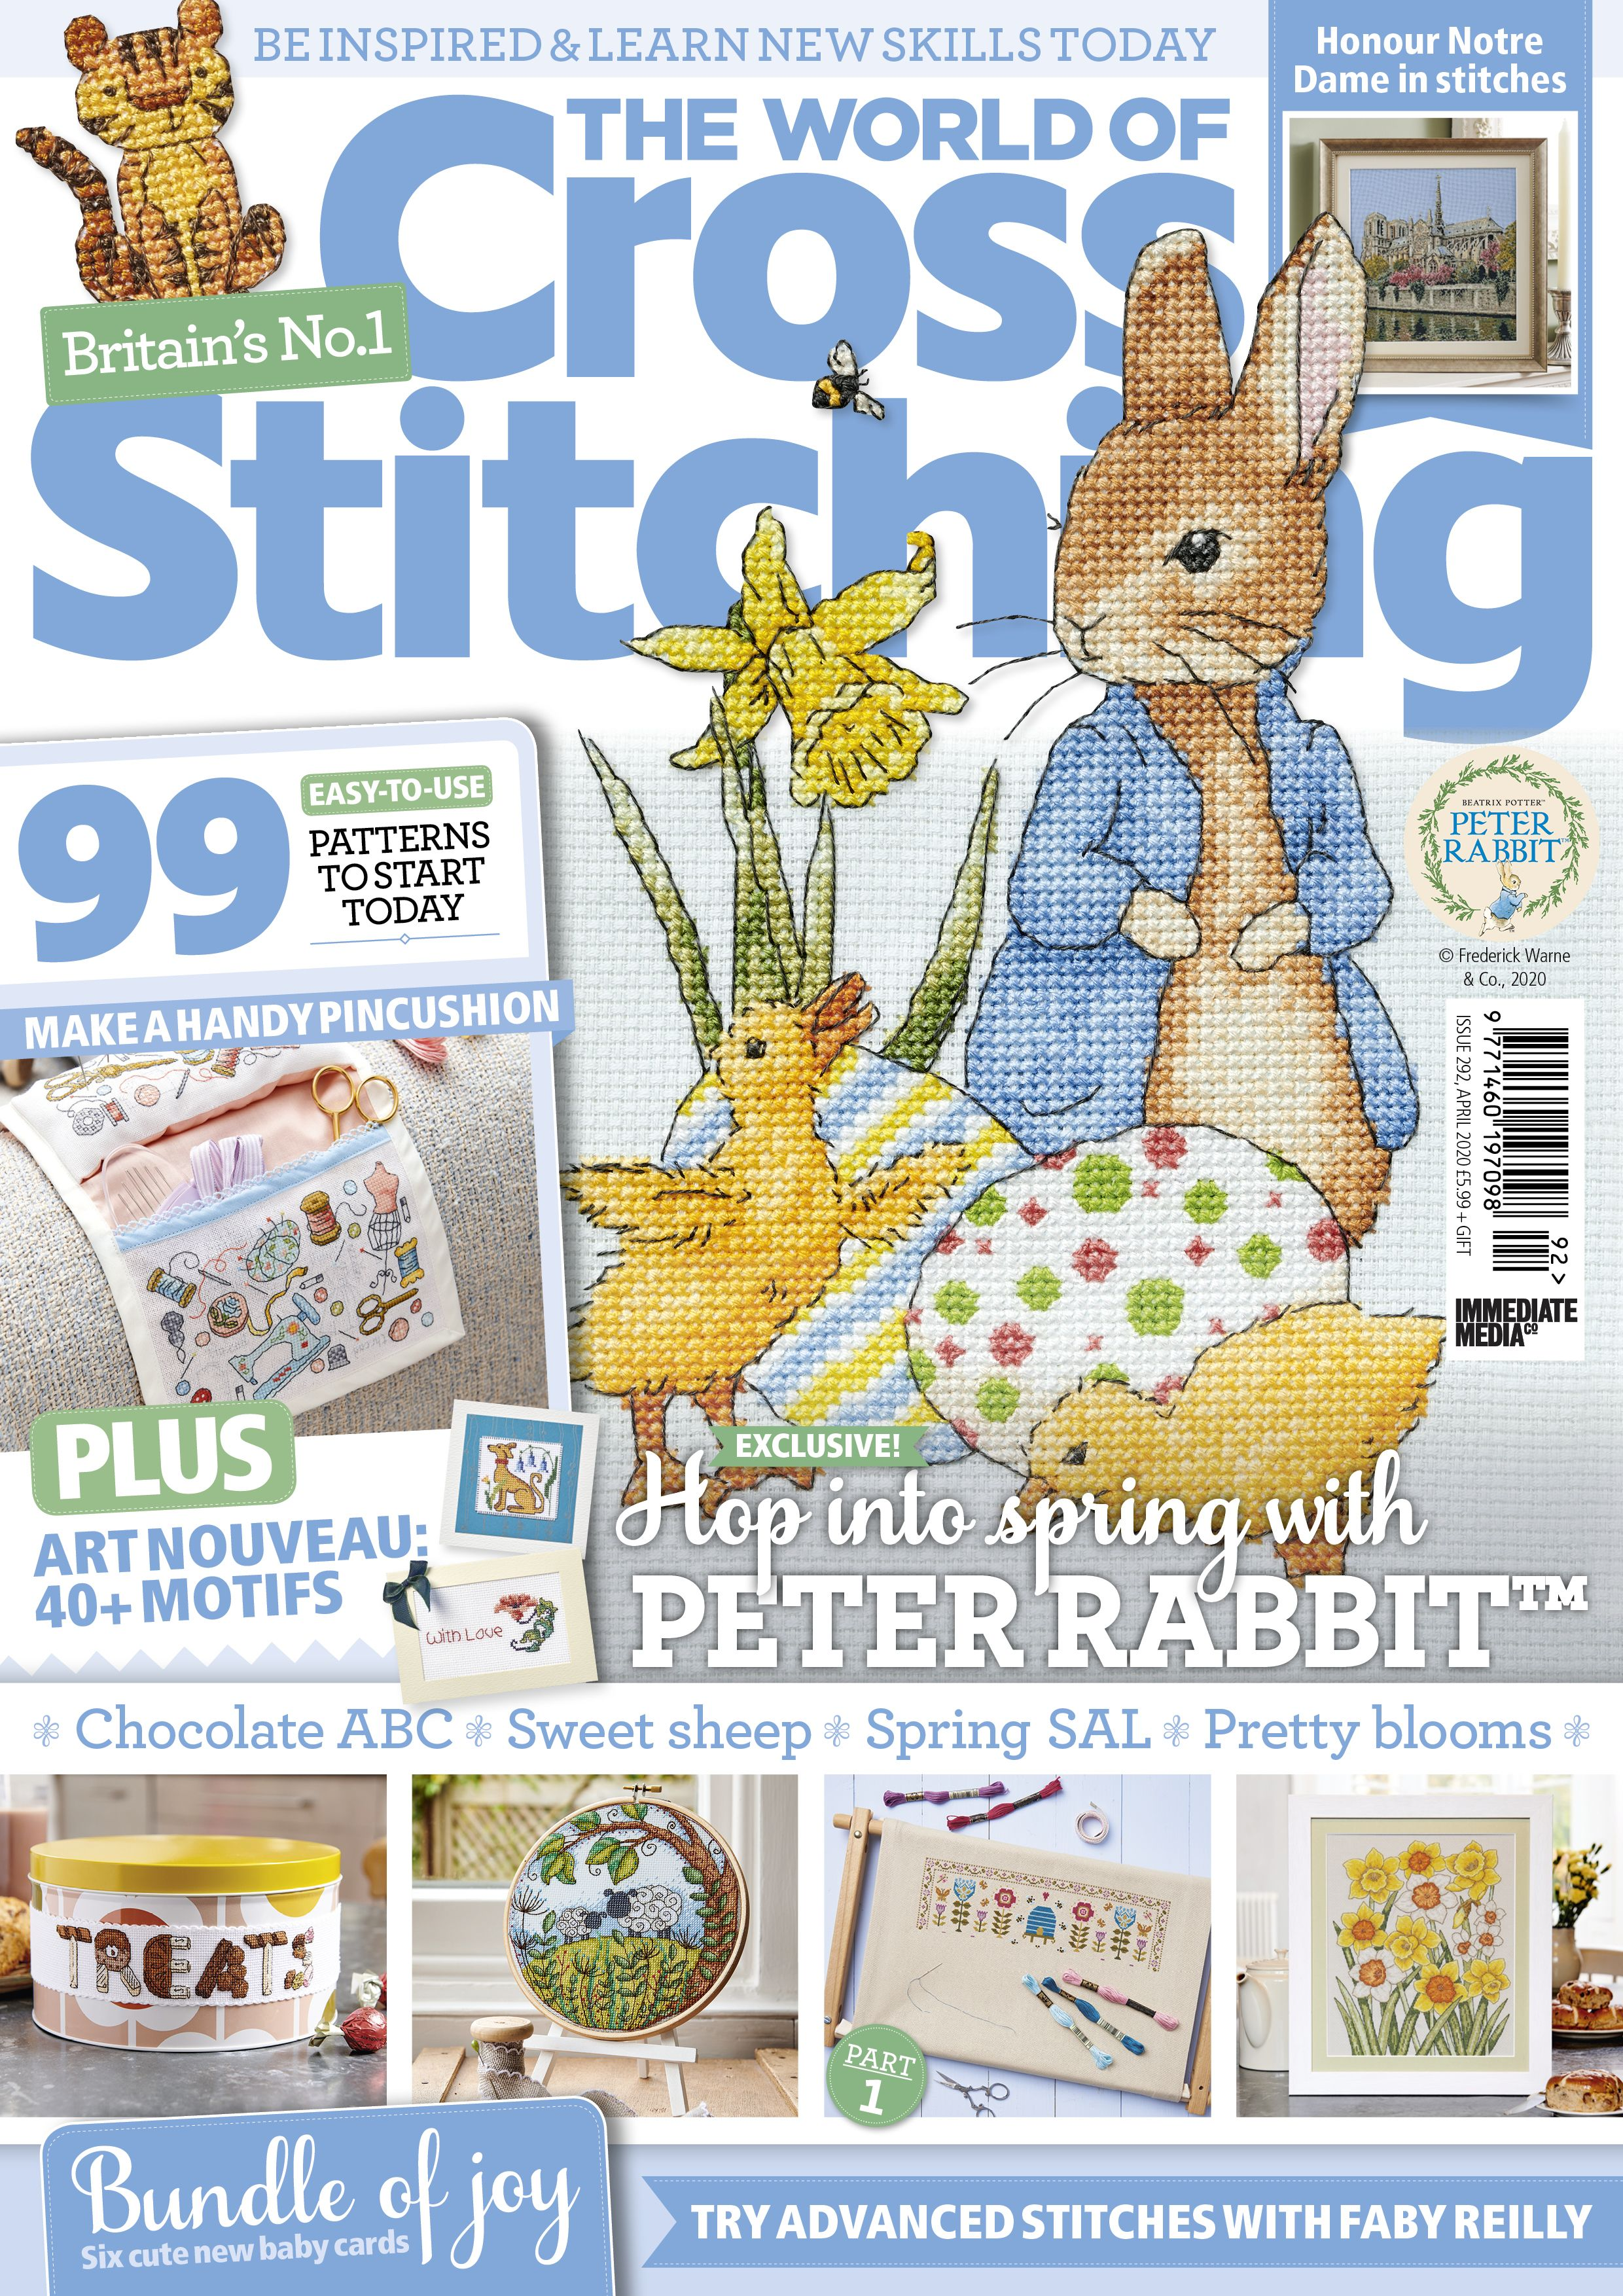 World Of Cross Stitching Christmas 2020 Pin by Sharon Hilsdon on cross stitch in 2020 | Cross stitching